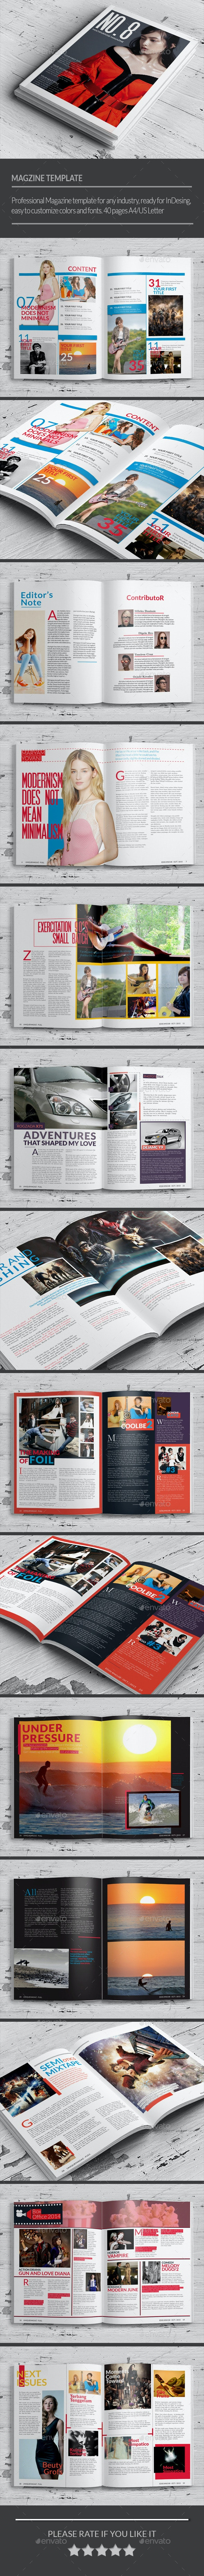 No.8 Magazine Template - Magazines Print Templates